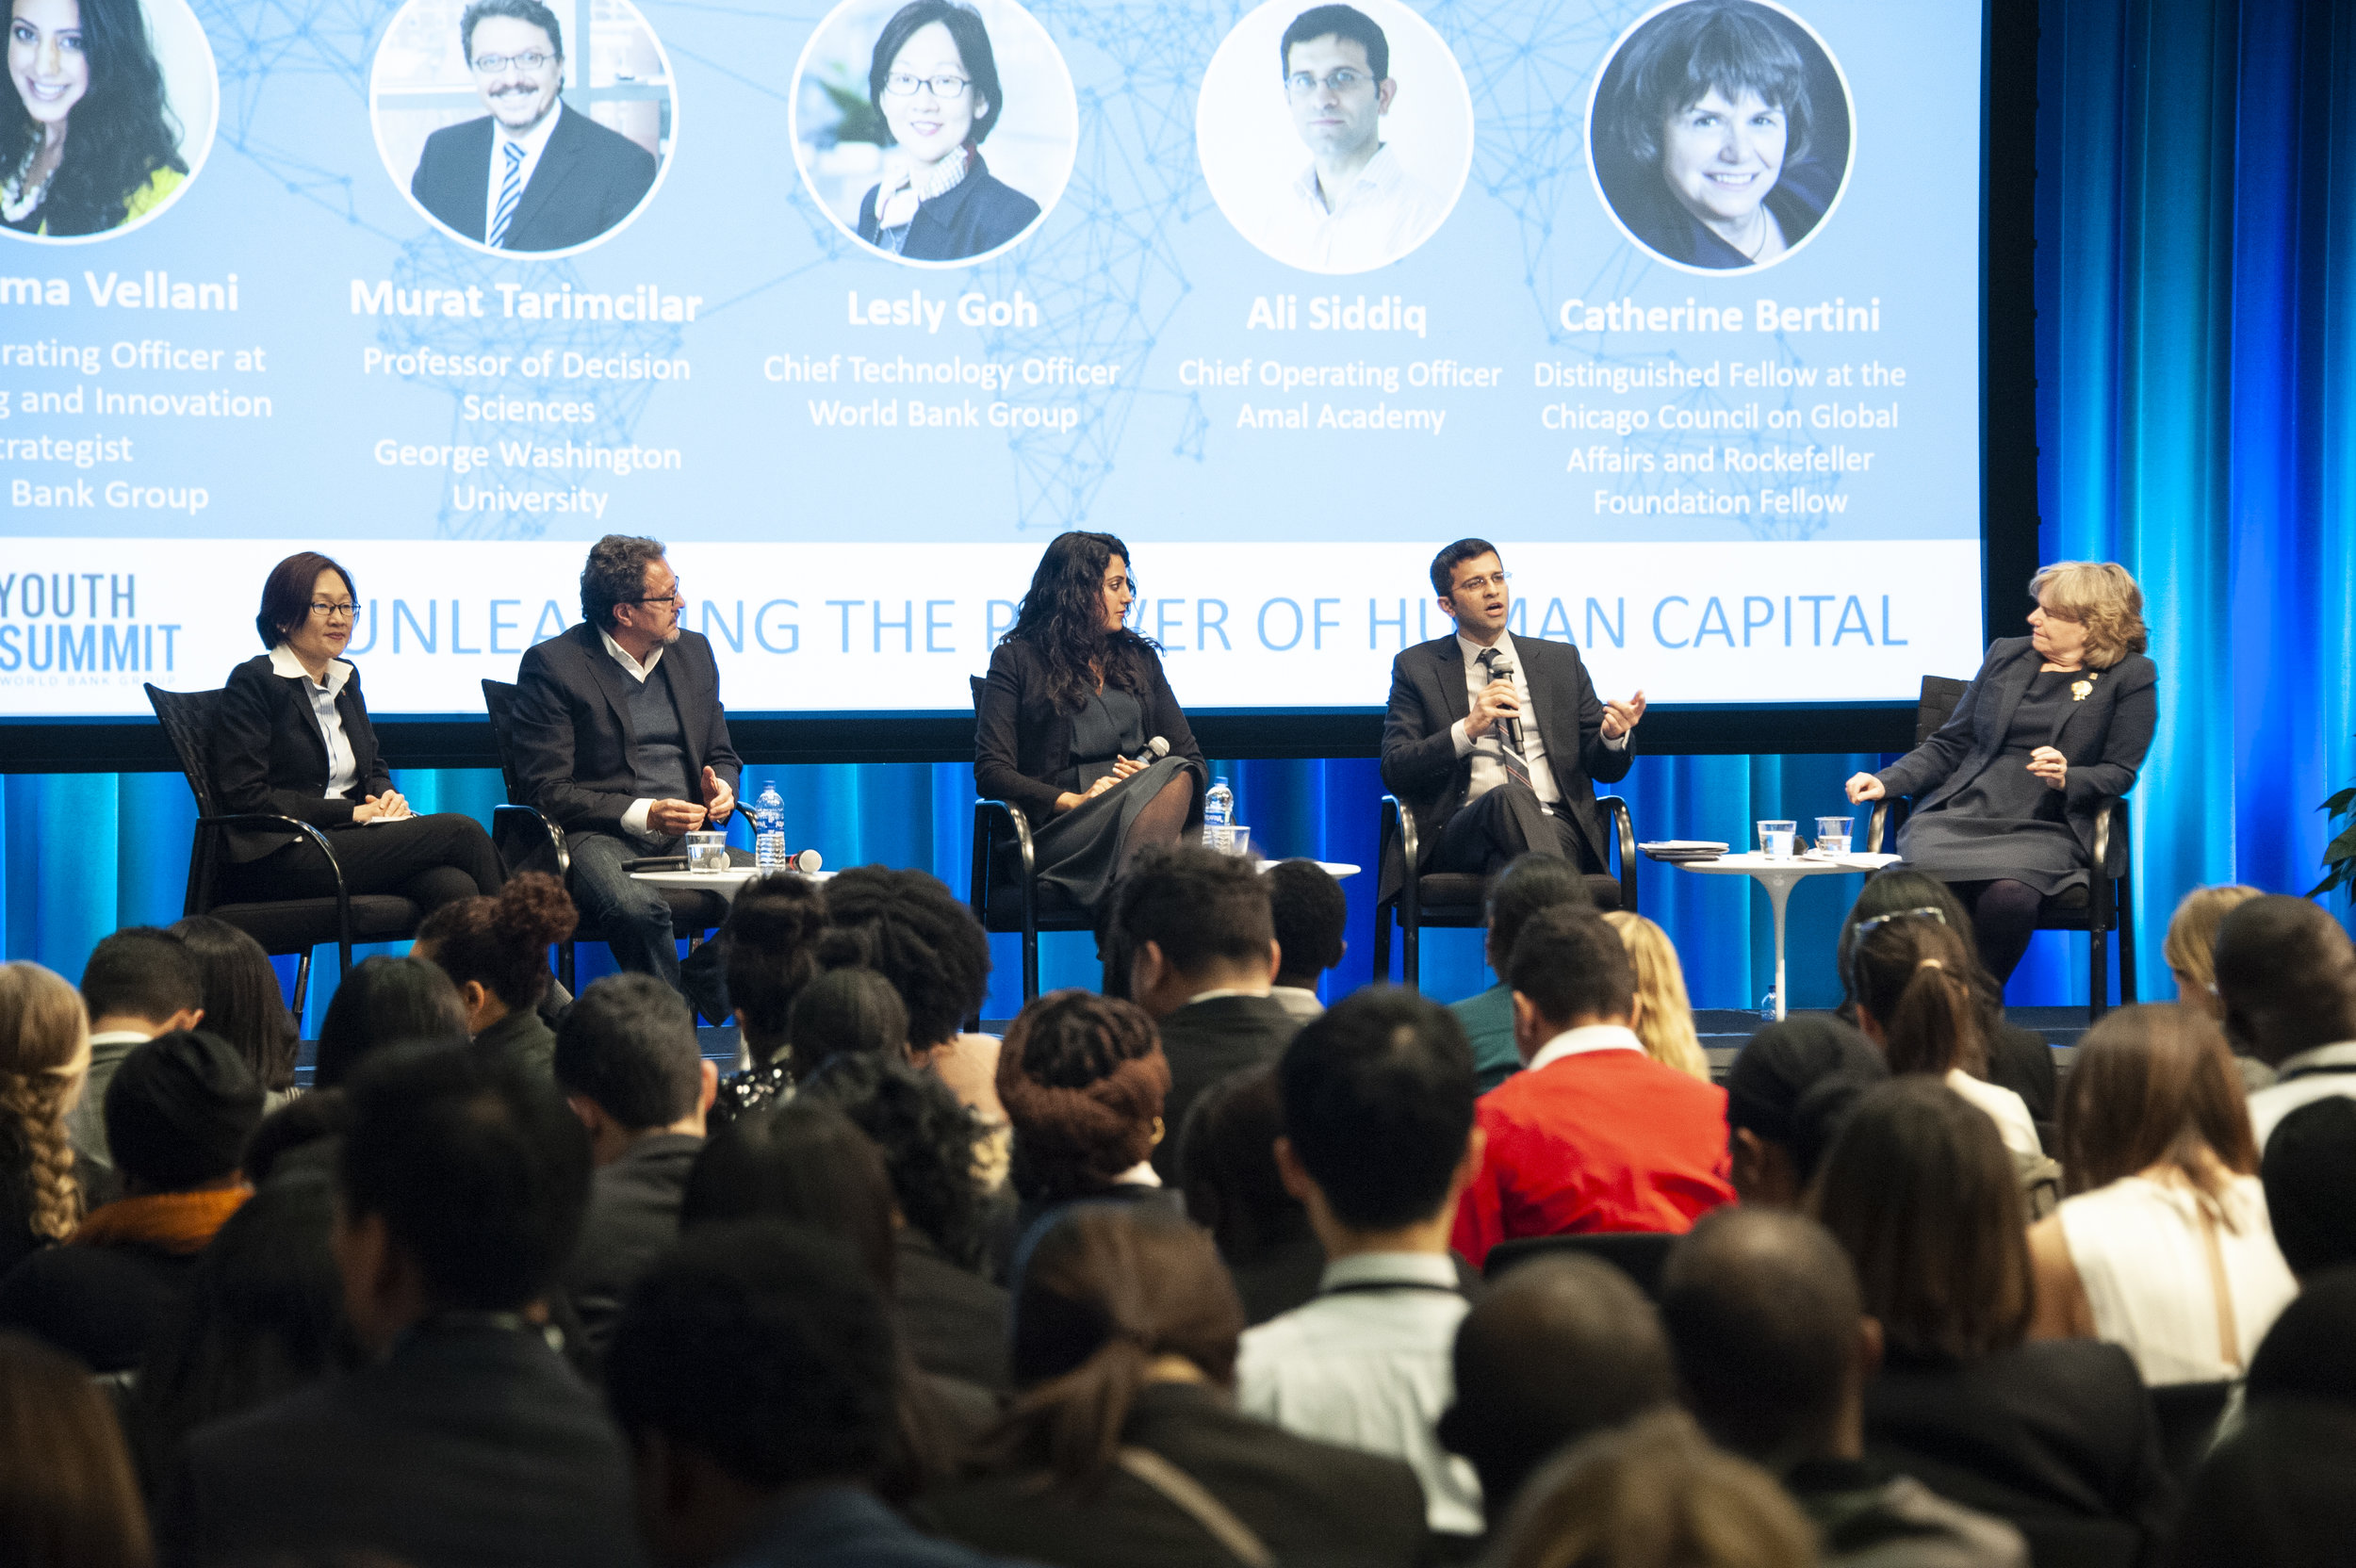 Chicago Council on Global Affairs Symposium, Washington DC 2018